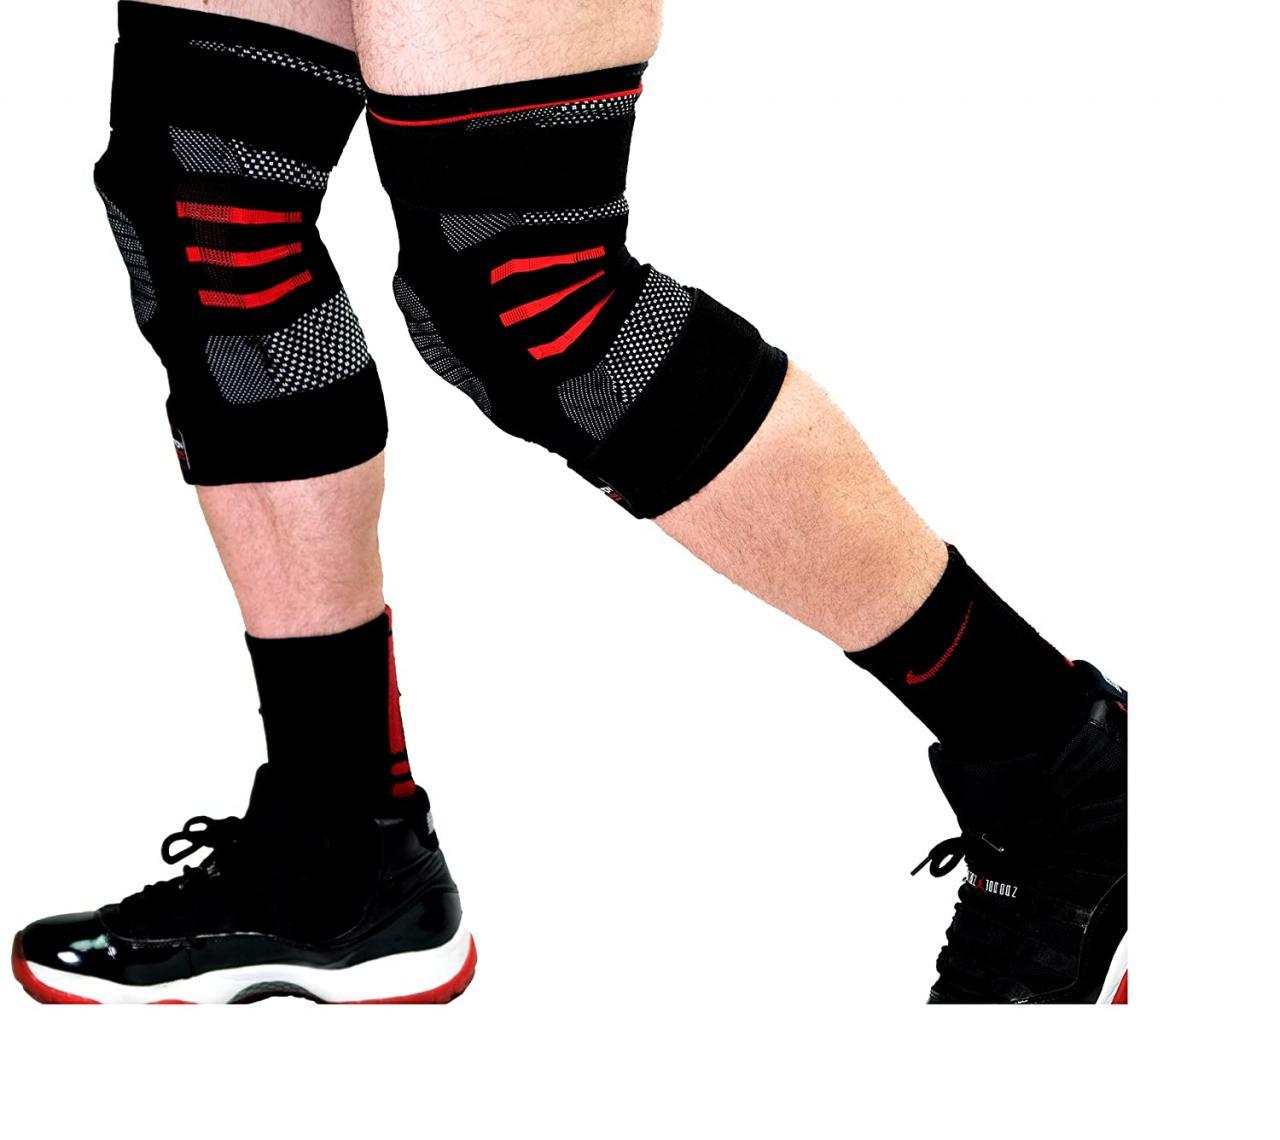 Low Impact Exercise Benefits | Safe & Smart Fitness - Dark Iron Fitness Knee Sleeves